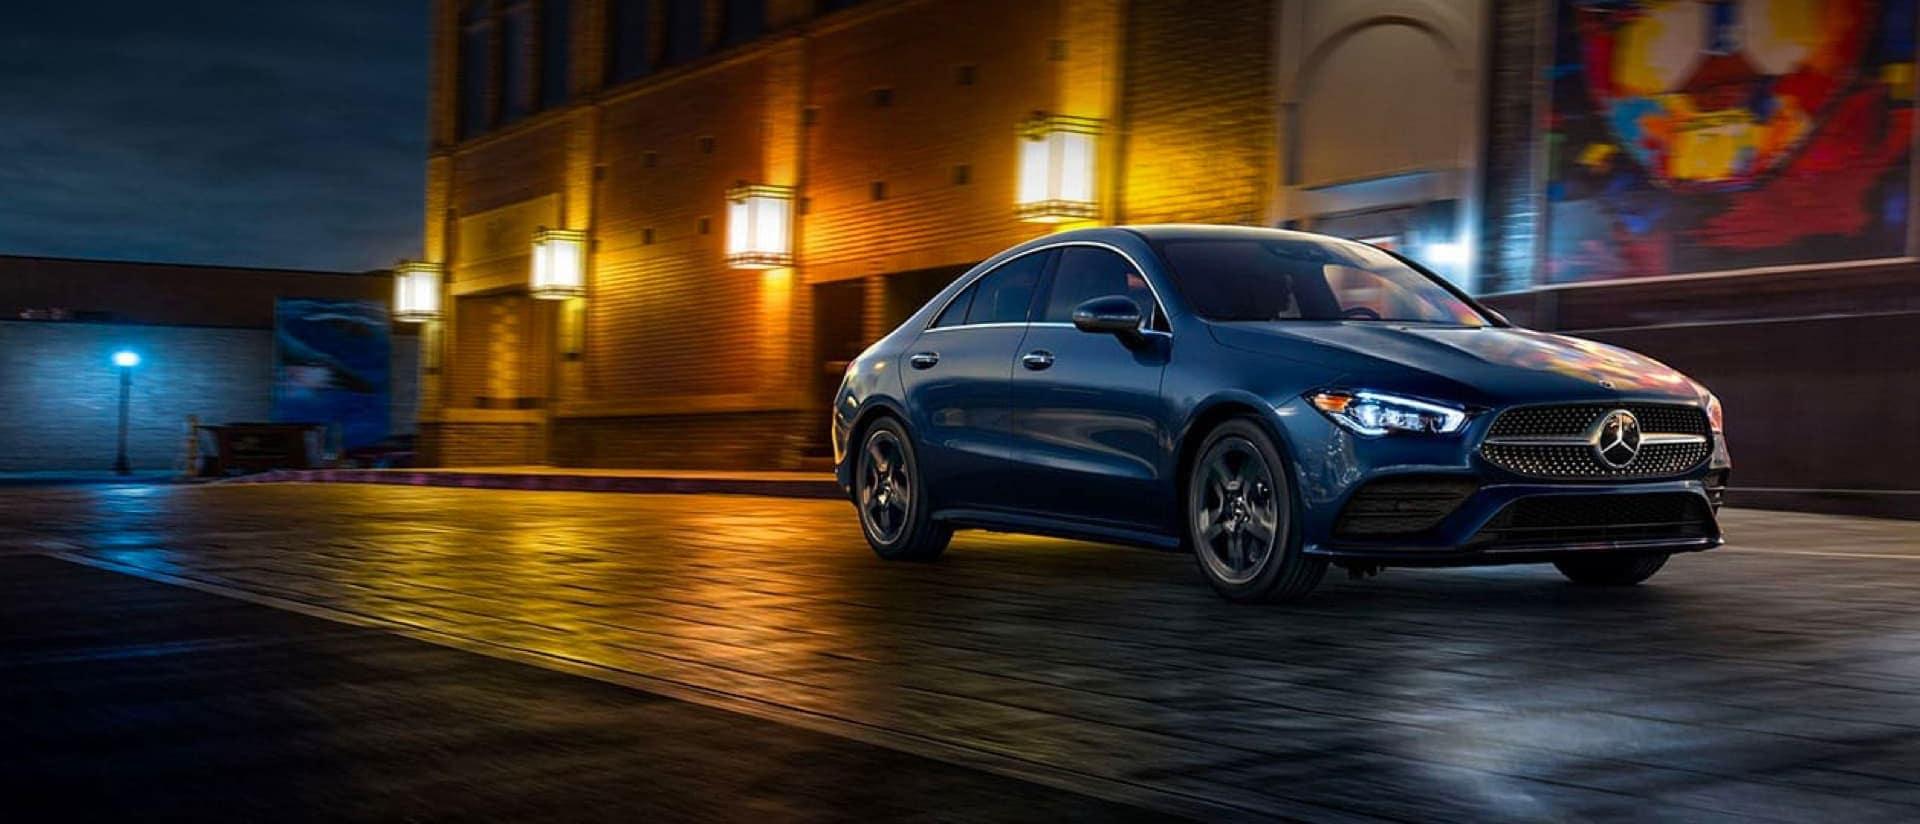 Mercedes-Benz sedan driving in the night